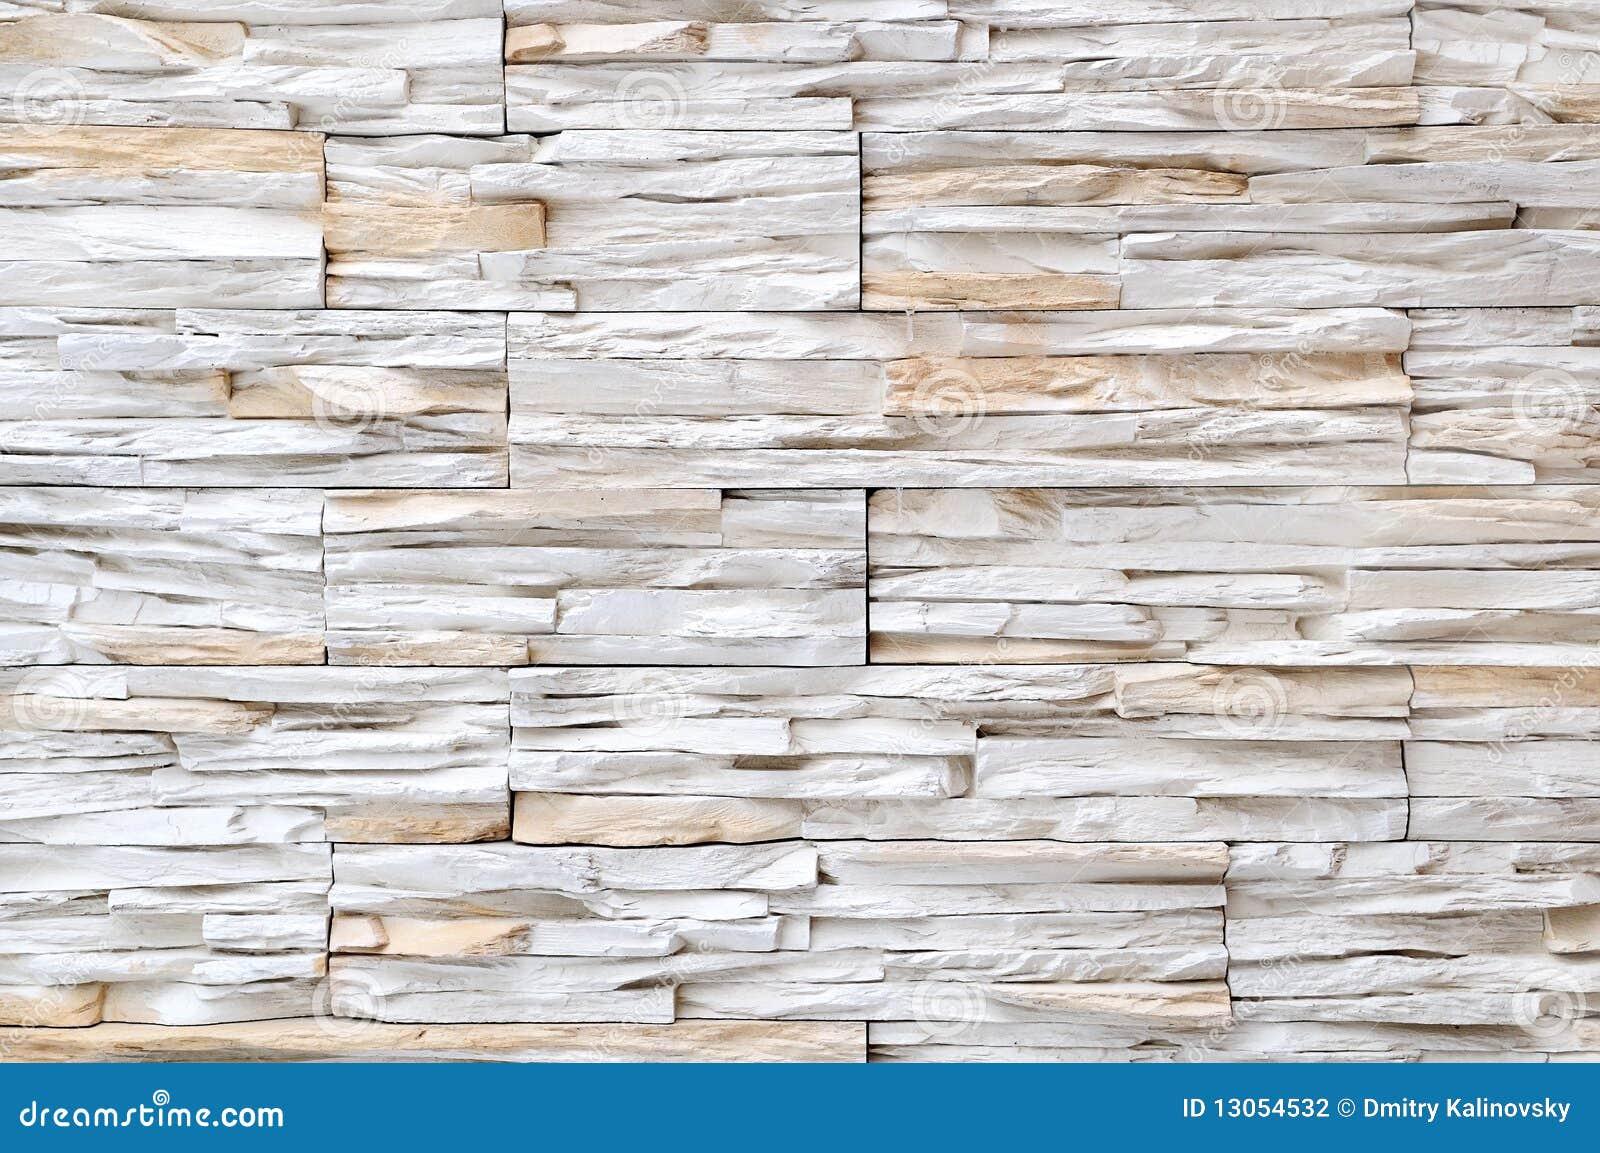 White brick stone wall texture